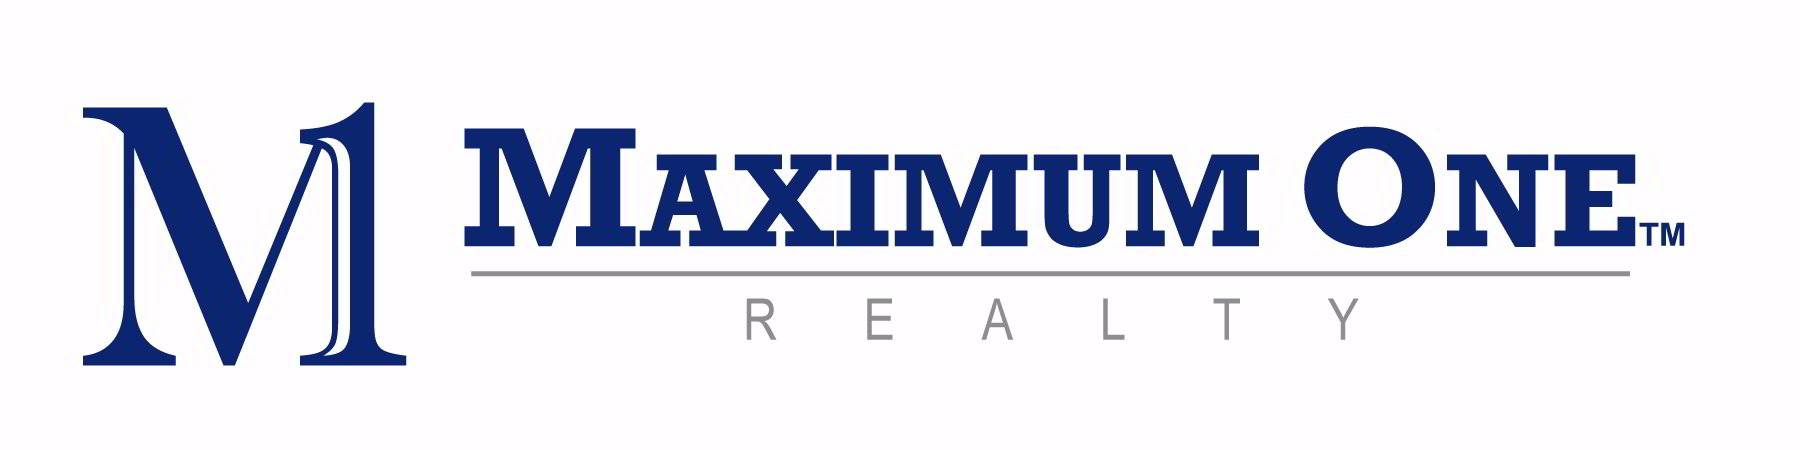 Maximum One Realty